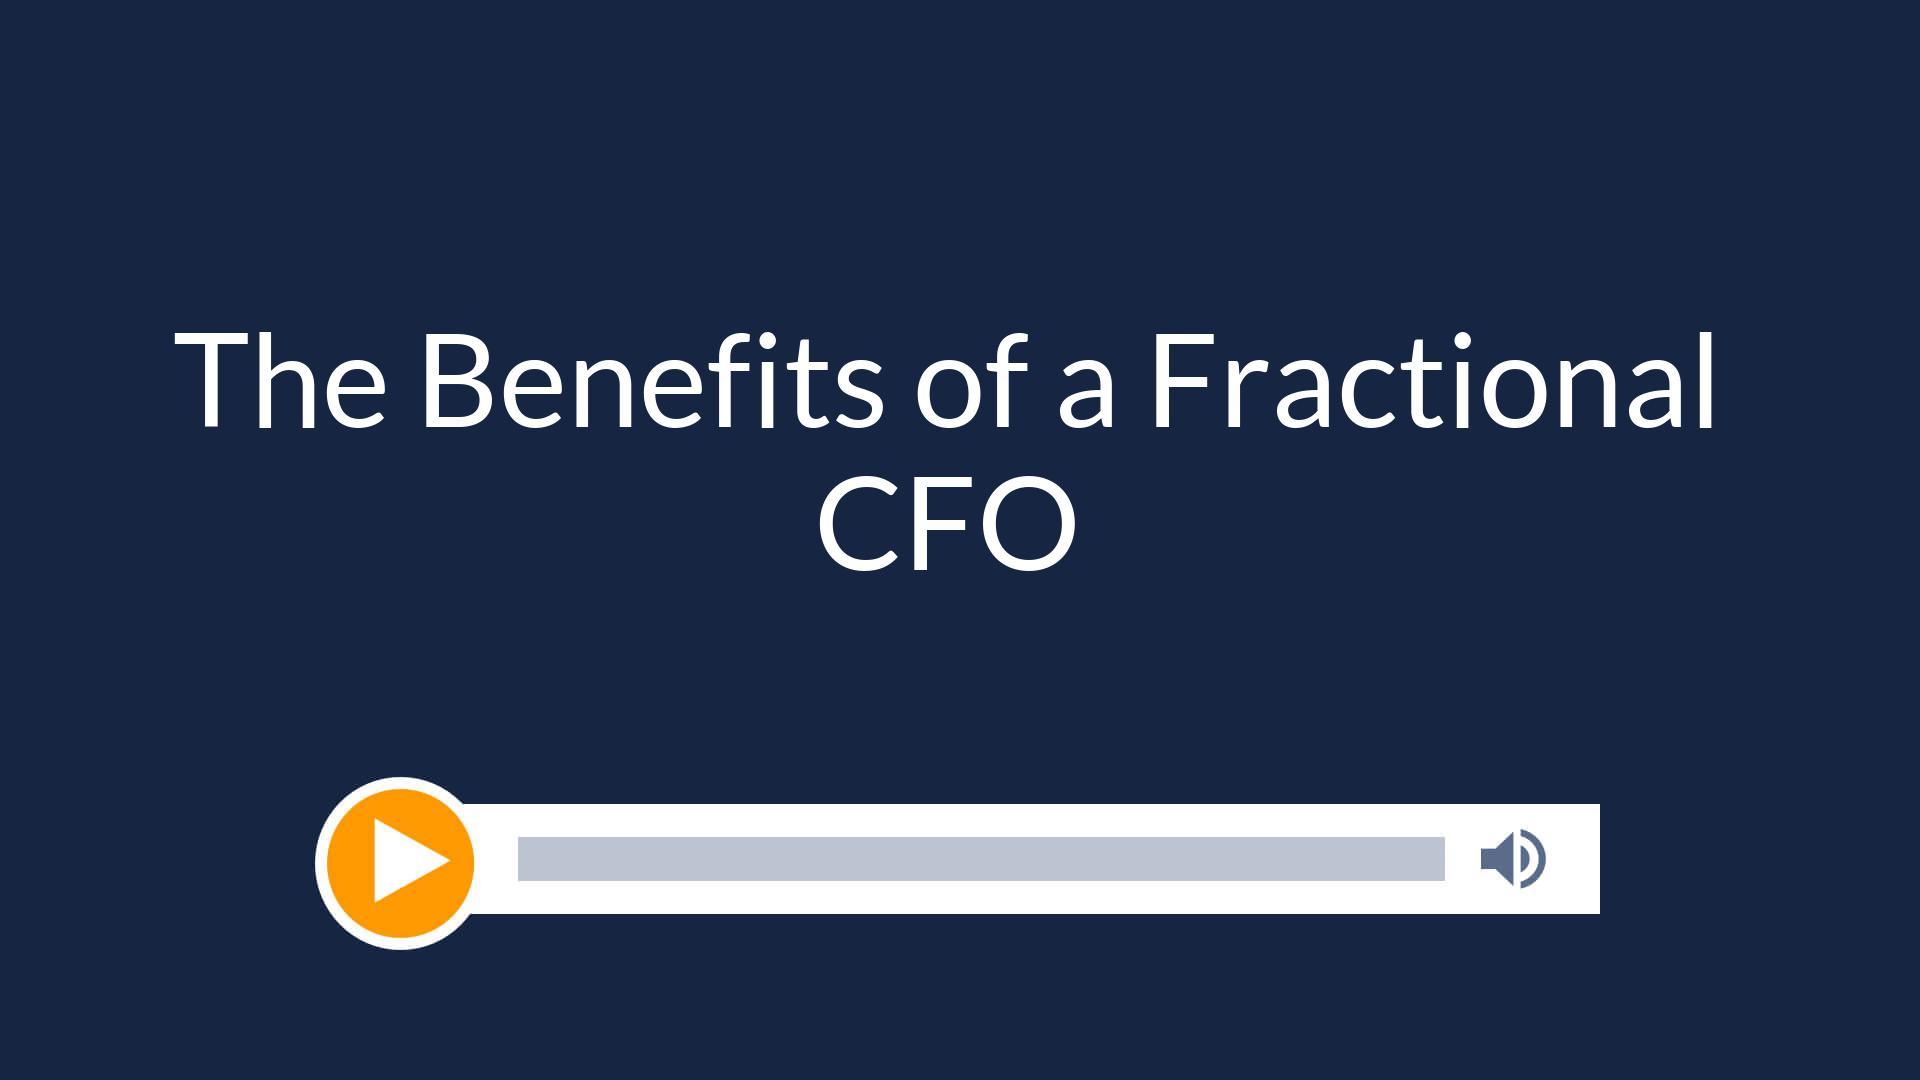 Benefits of a Fractional CFO